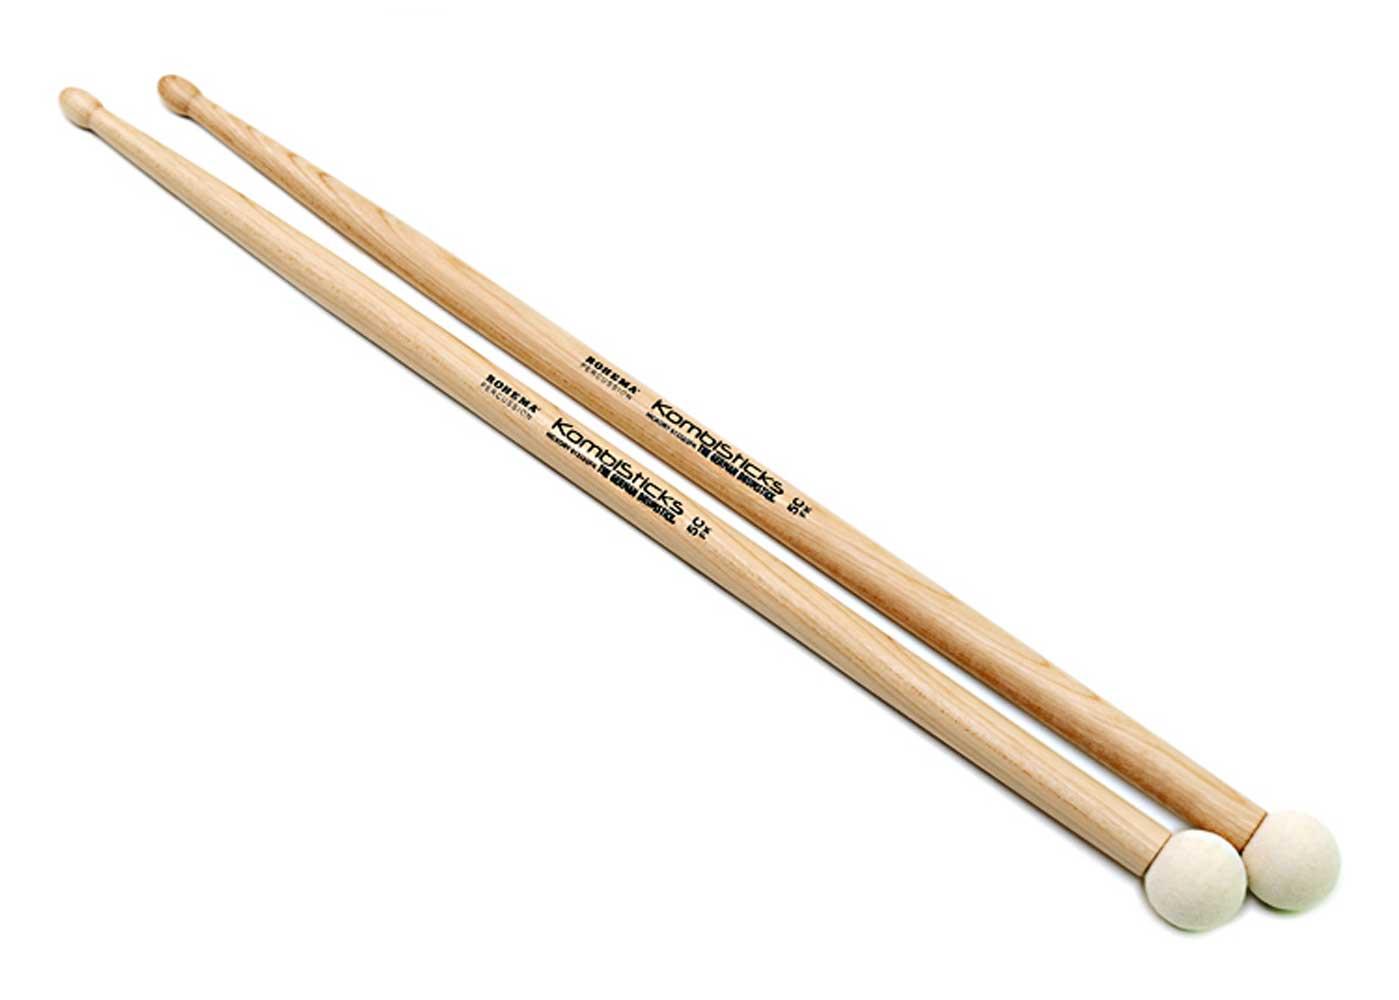 rohema 61332 2fk the german drumstick kombi sticks 5c. Black Bedroom Furniture Sets. Home Design Ideas